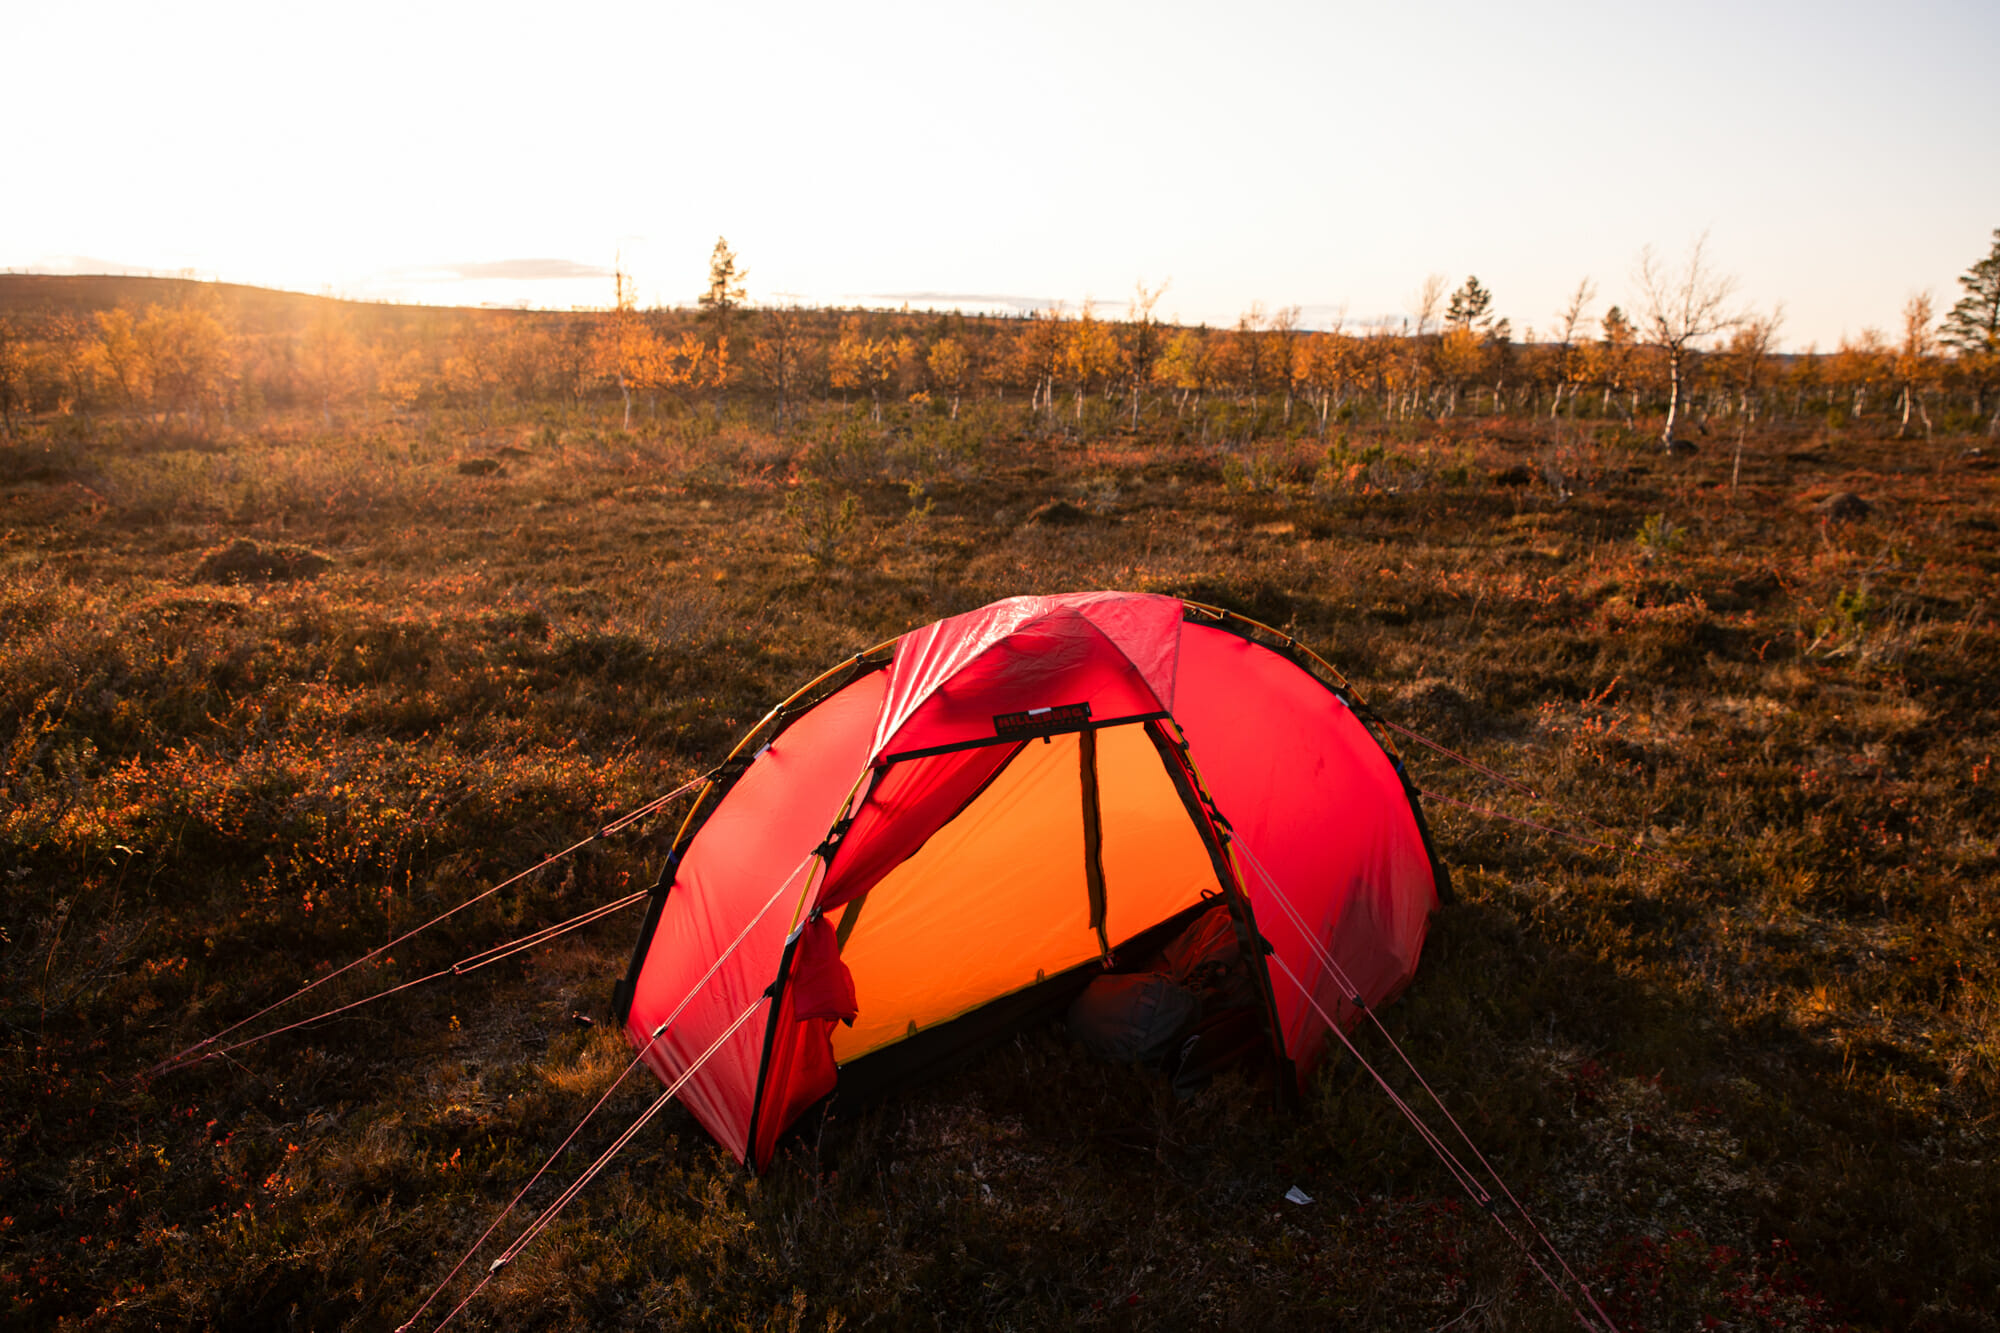 Bivouac en tente dans la zone sauvage de Hammastunturi